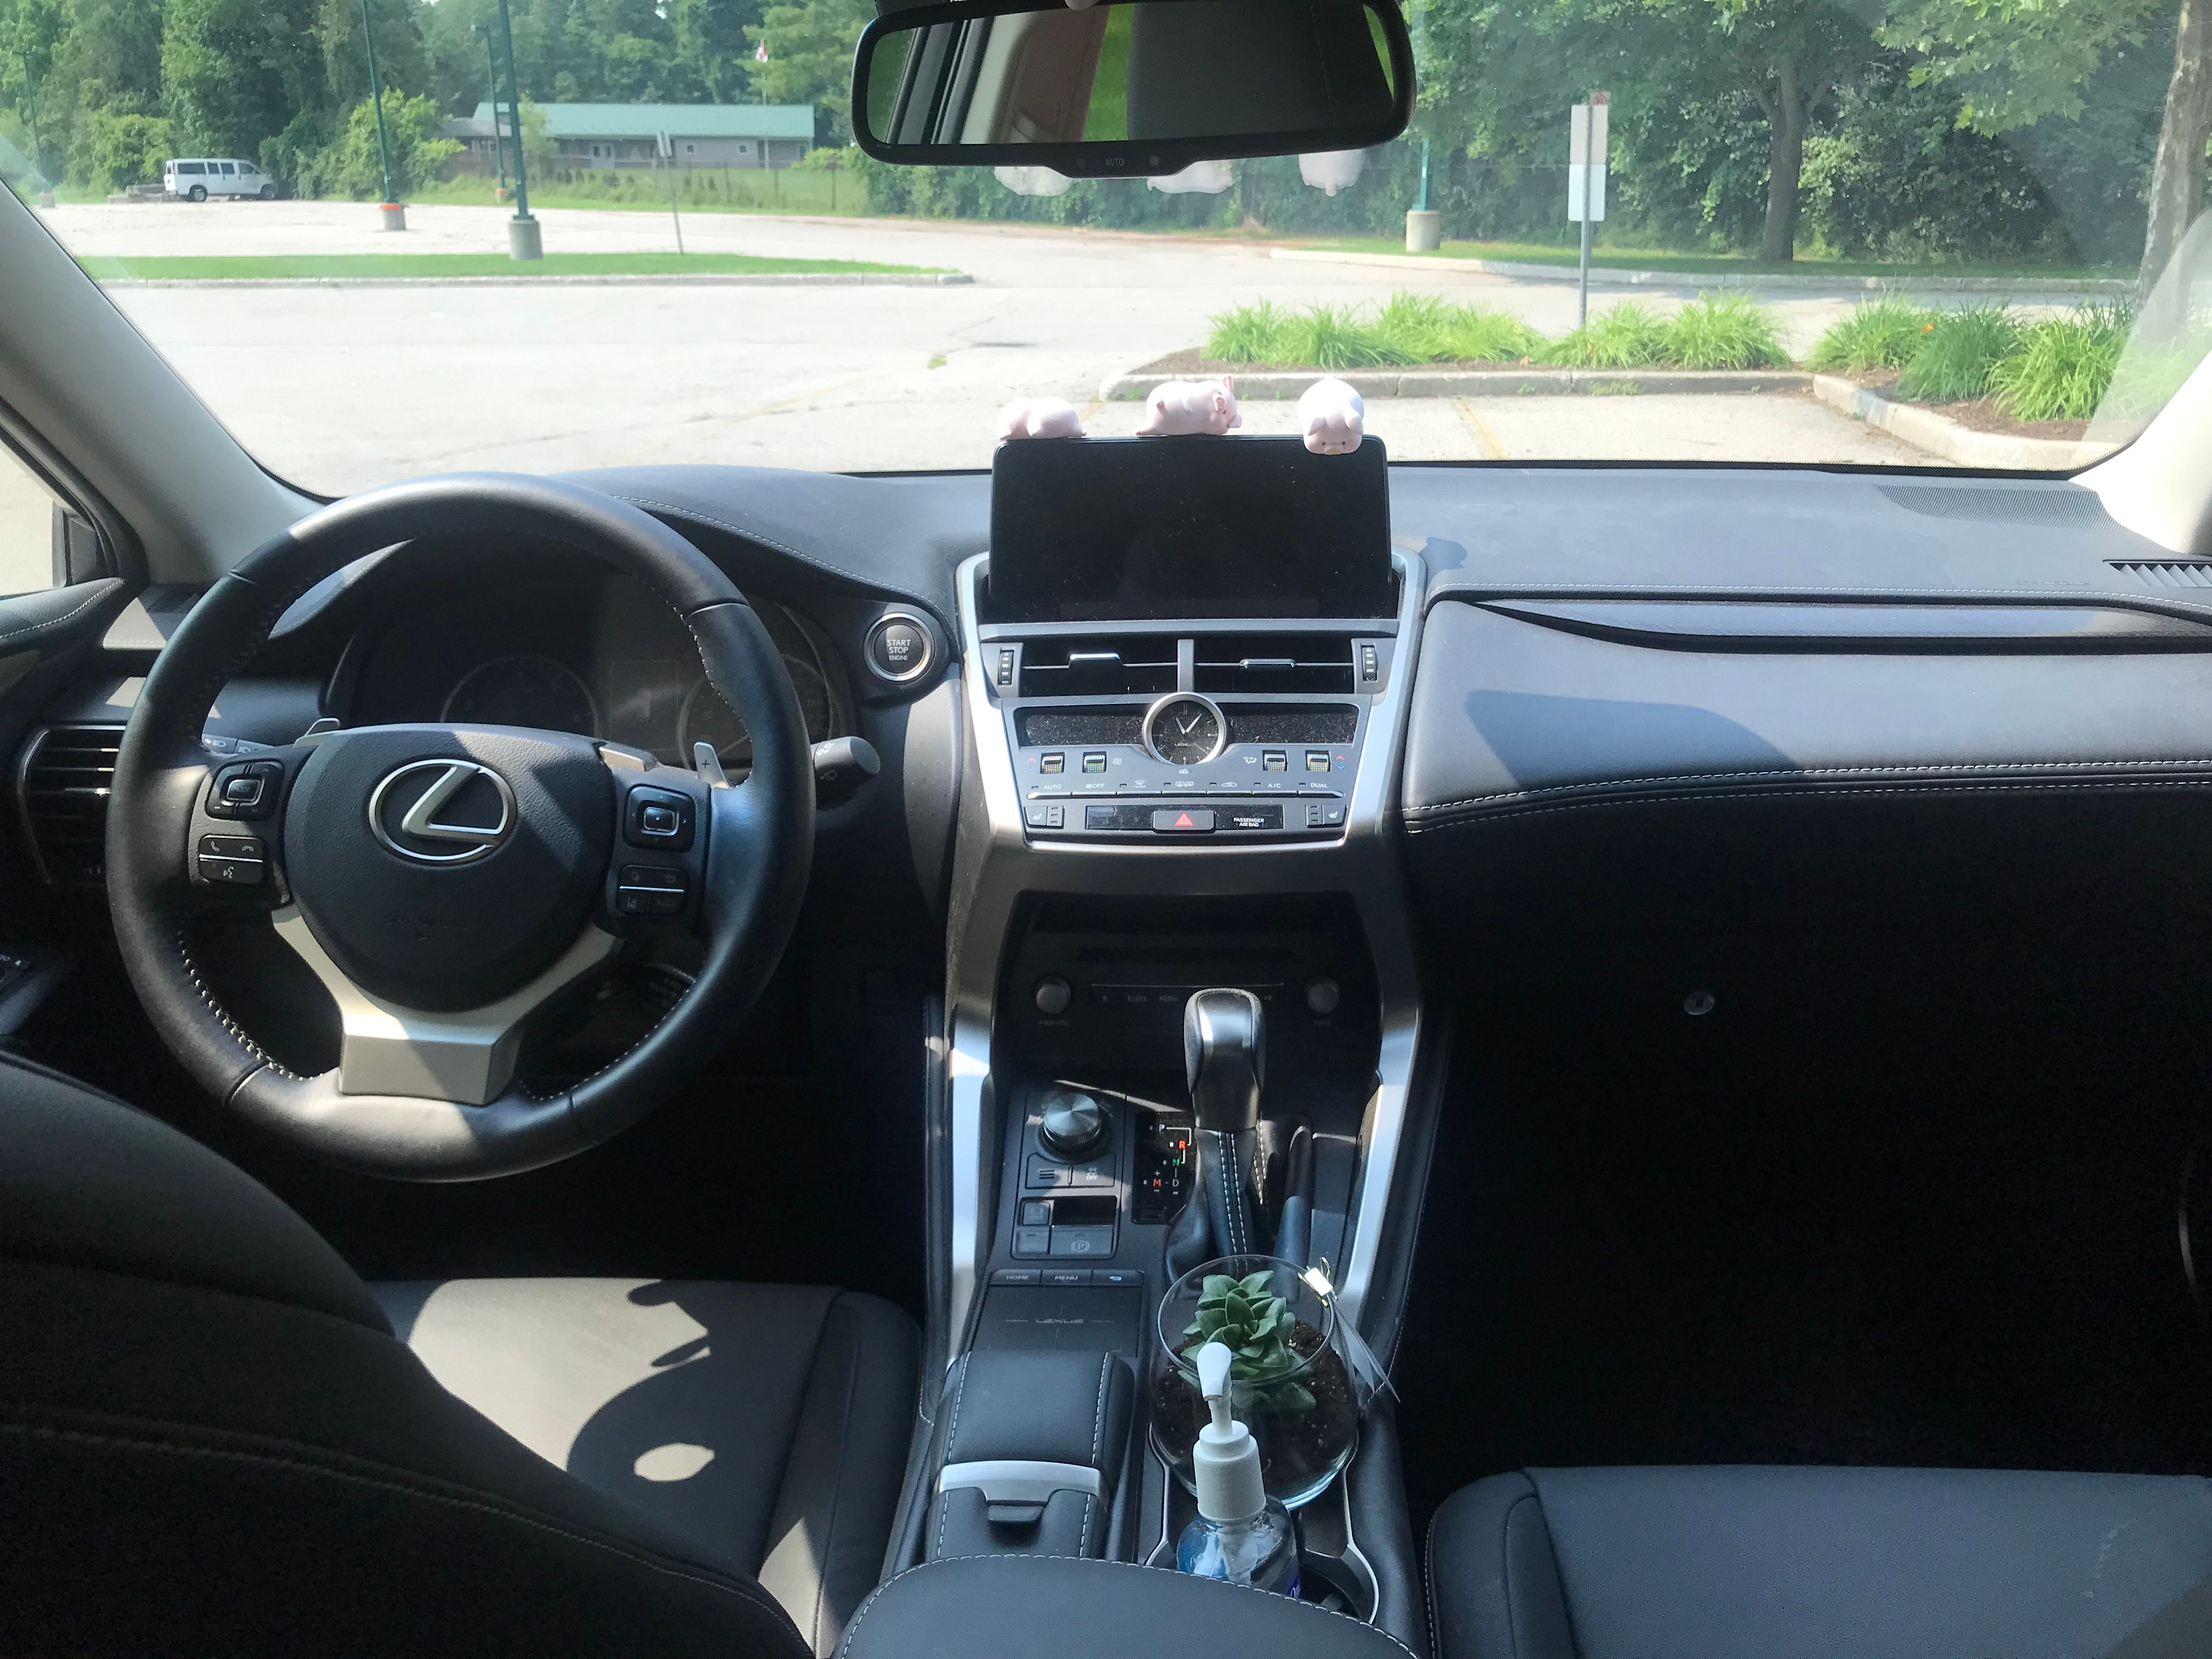 2019 Lexus NX 300 base model(标配) - INFOCAR - Toronto's Most Comprehensive New and Used Auto Trading Platform